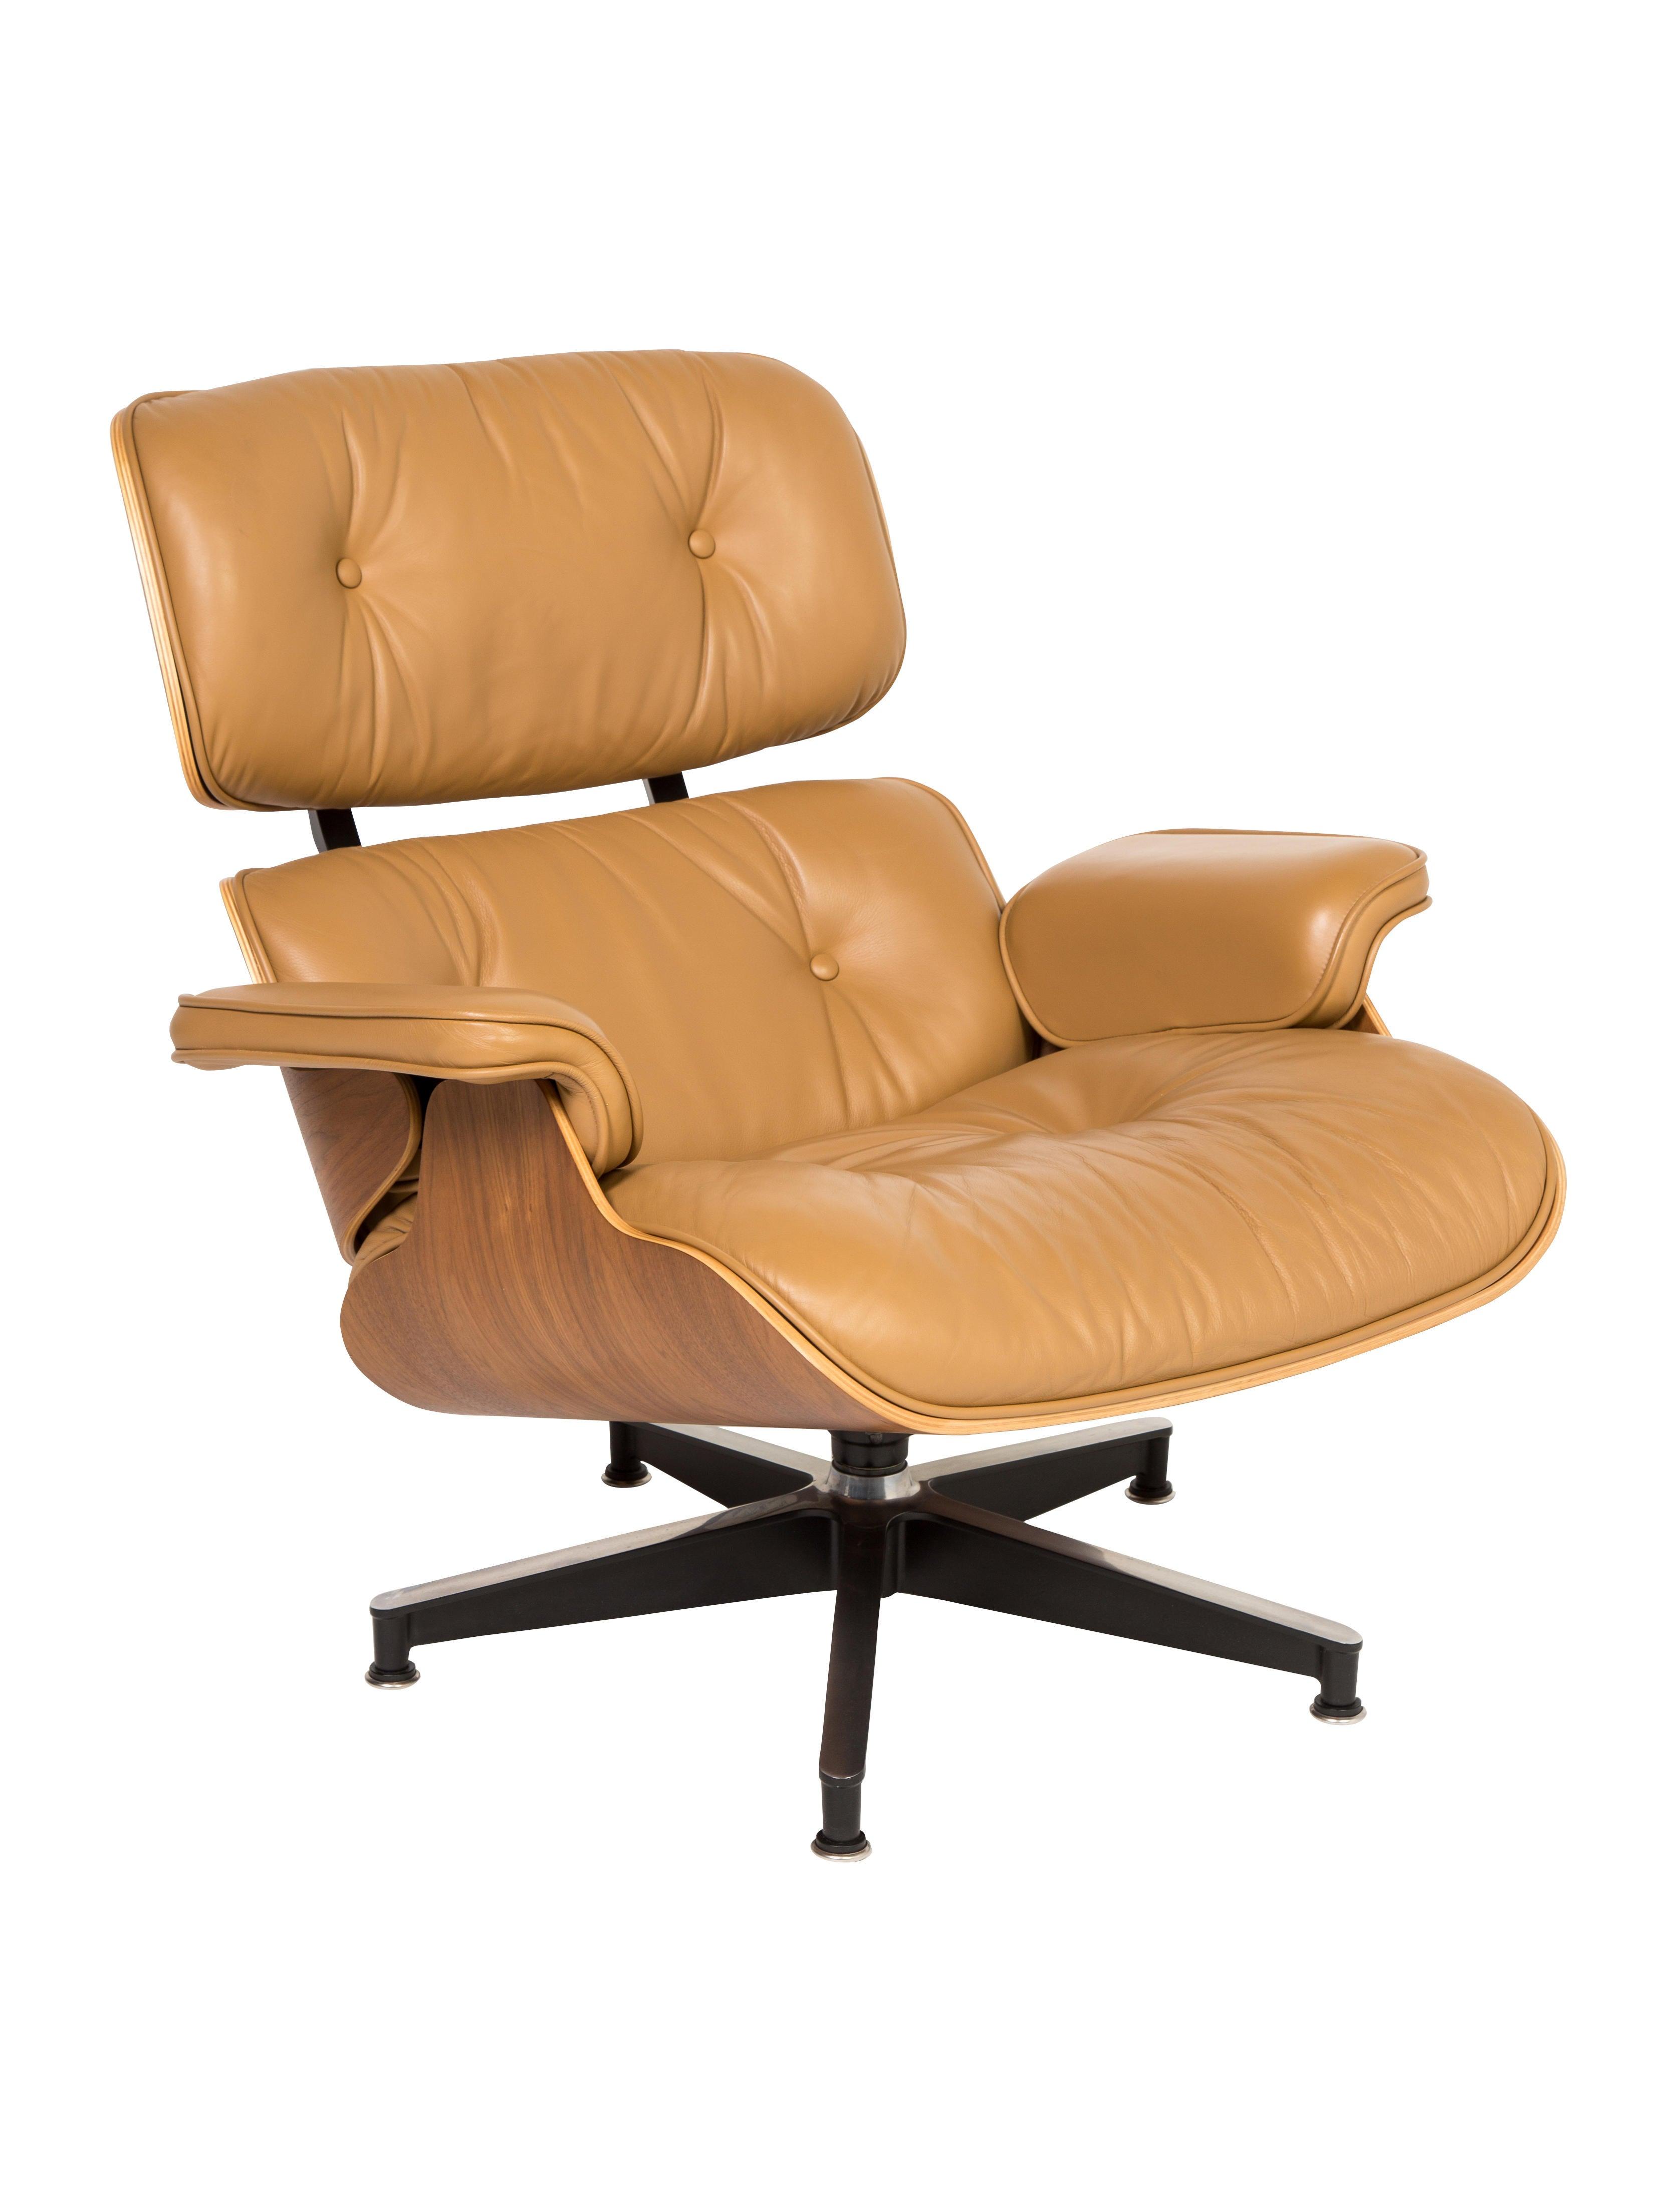 Herman miller eames lounge chair furniture hrmil20146 for Eames herman miller lounge chair